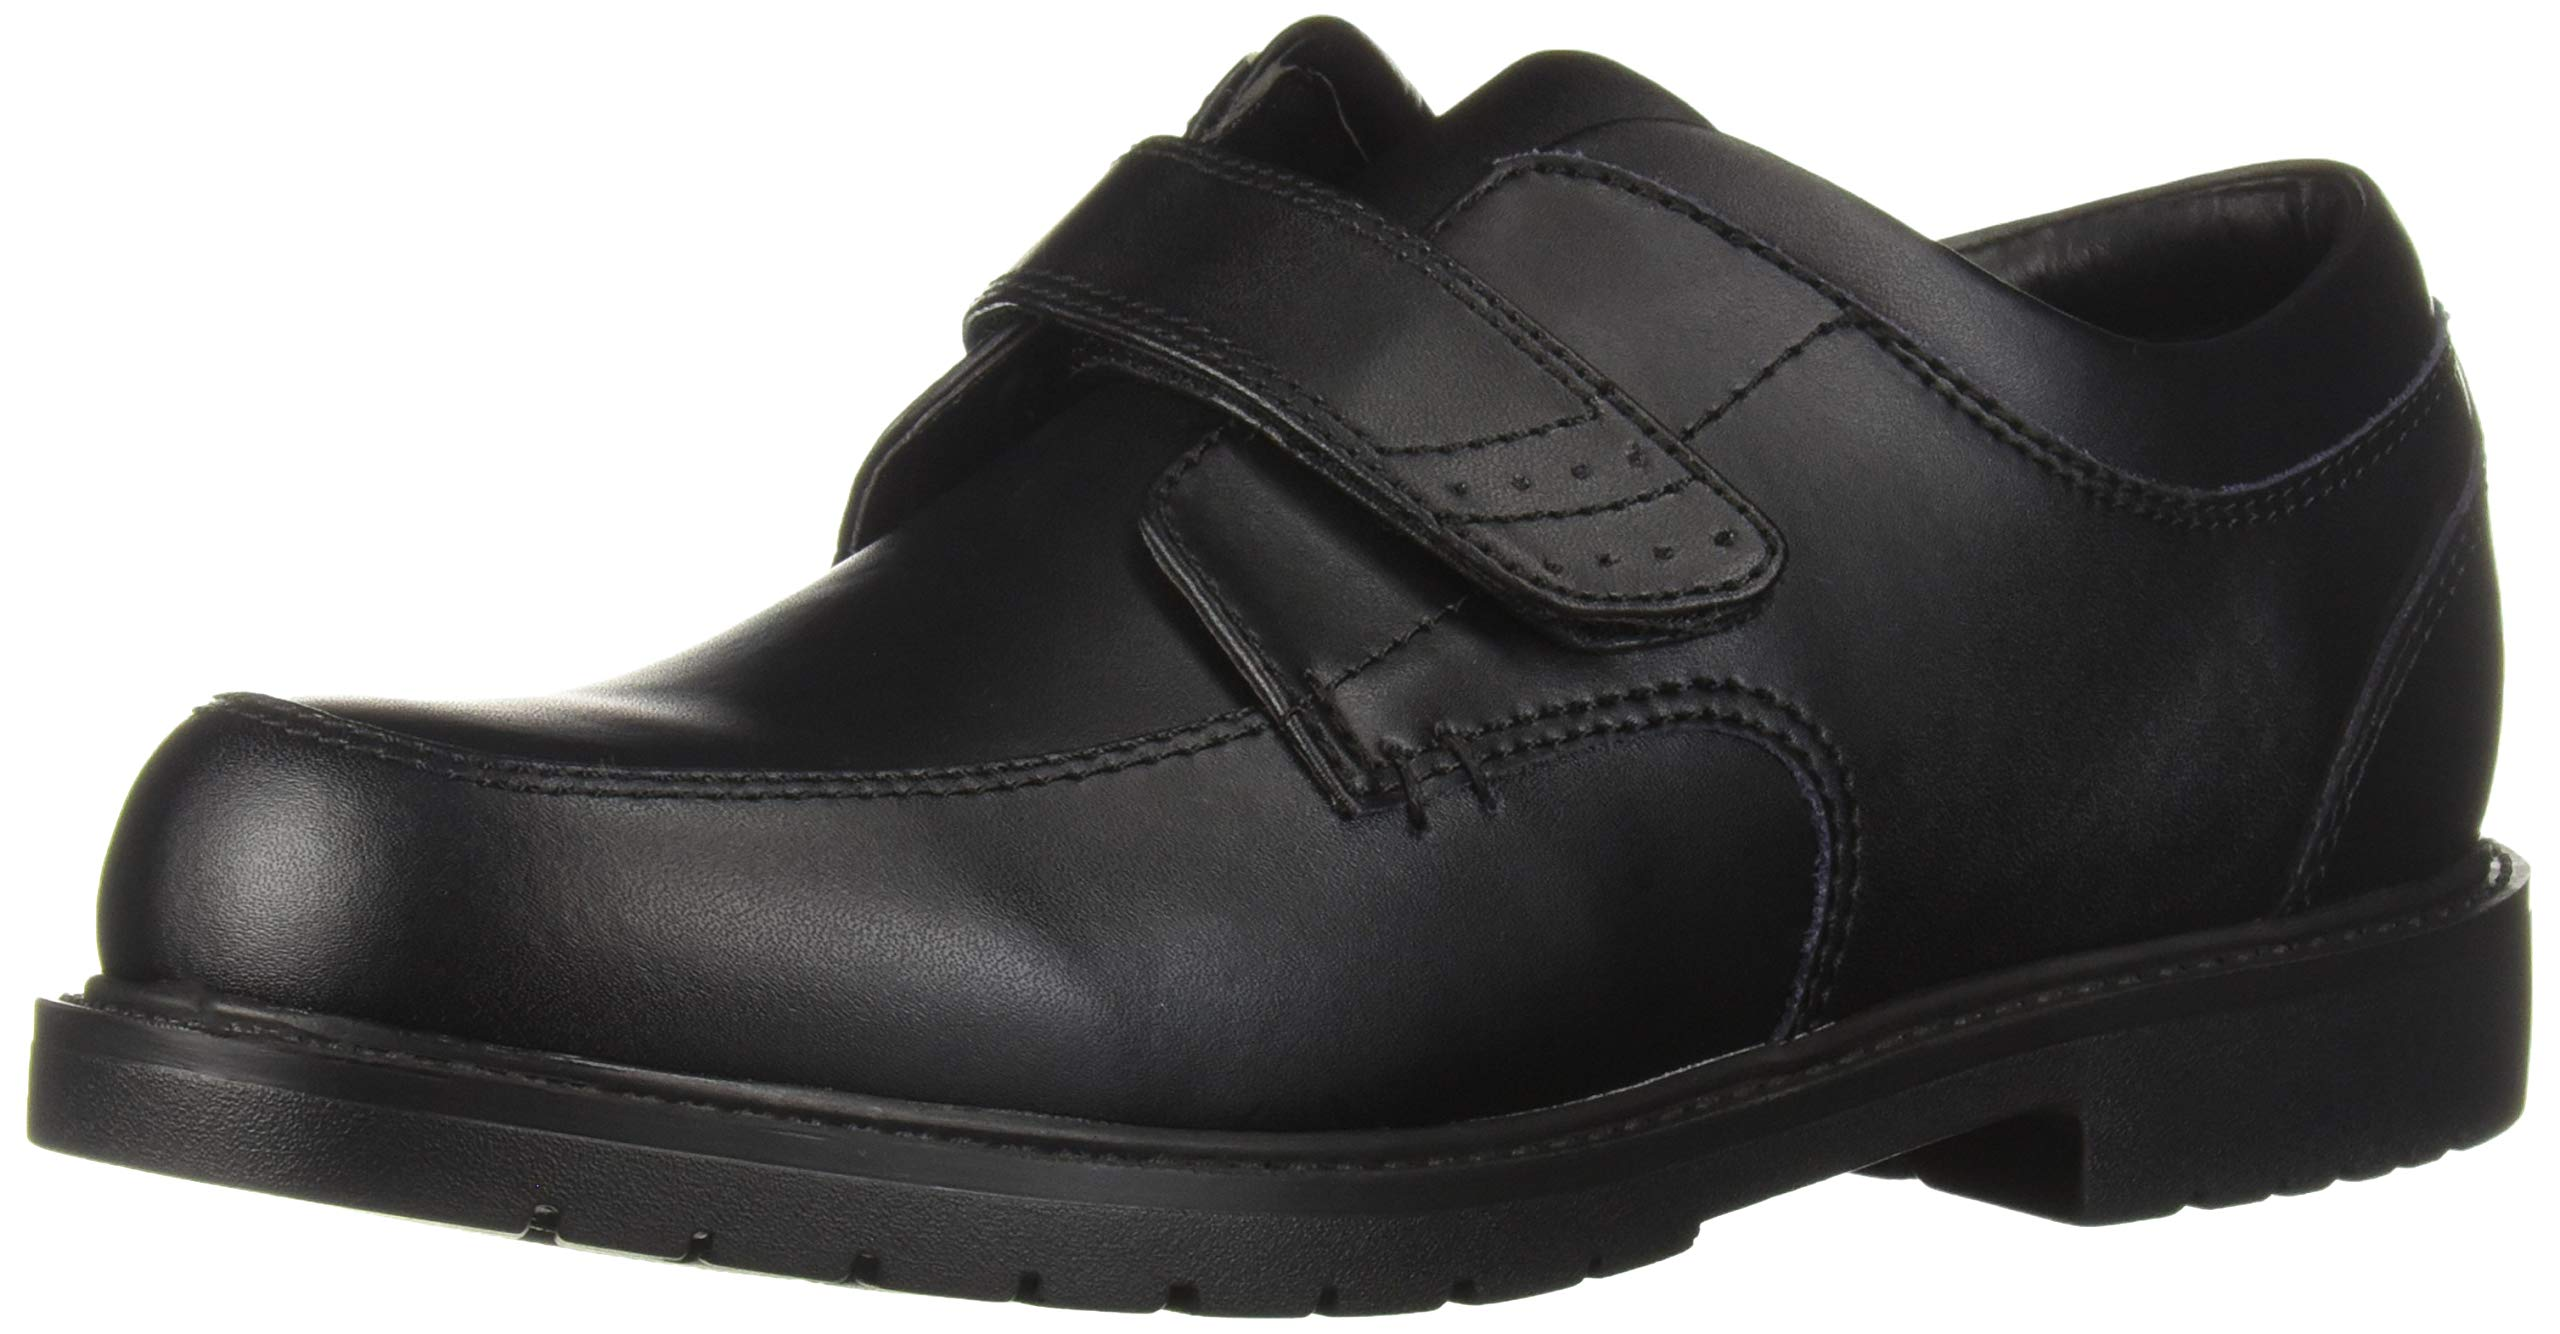 Academie Gear Boys' Inside School Uniform Shoe Black 6 Medium US Big Kid